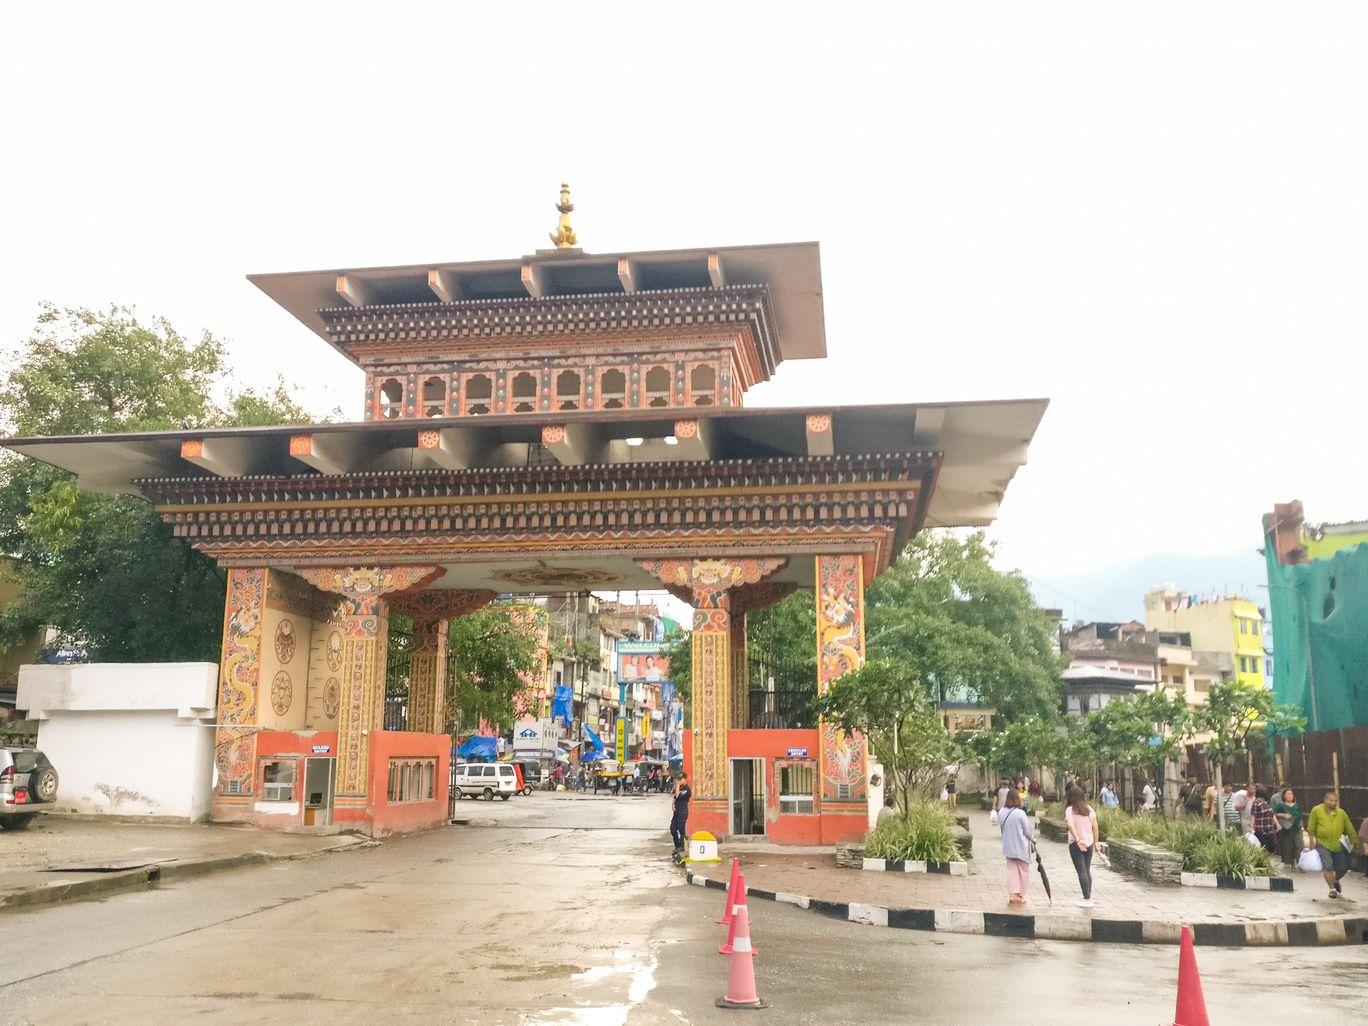 Photo of Bhutan By Rucha Parab